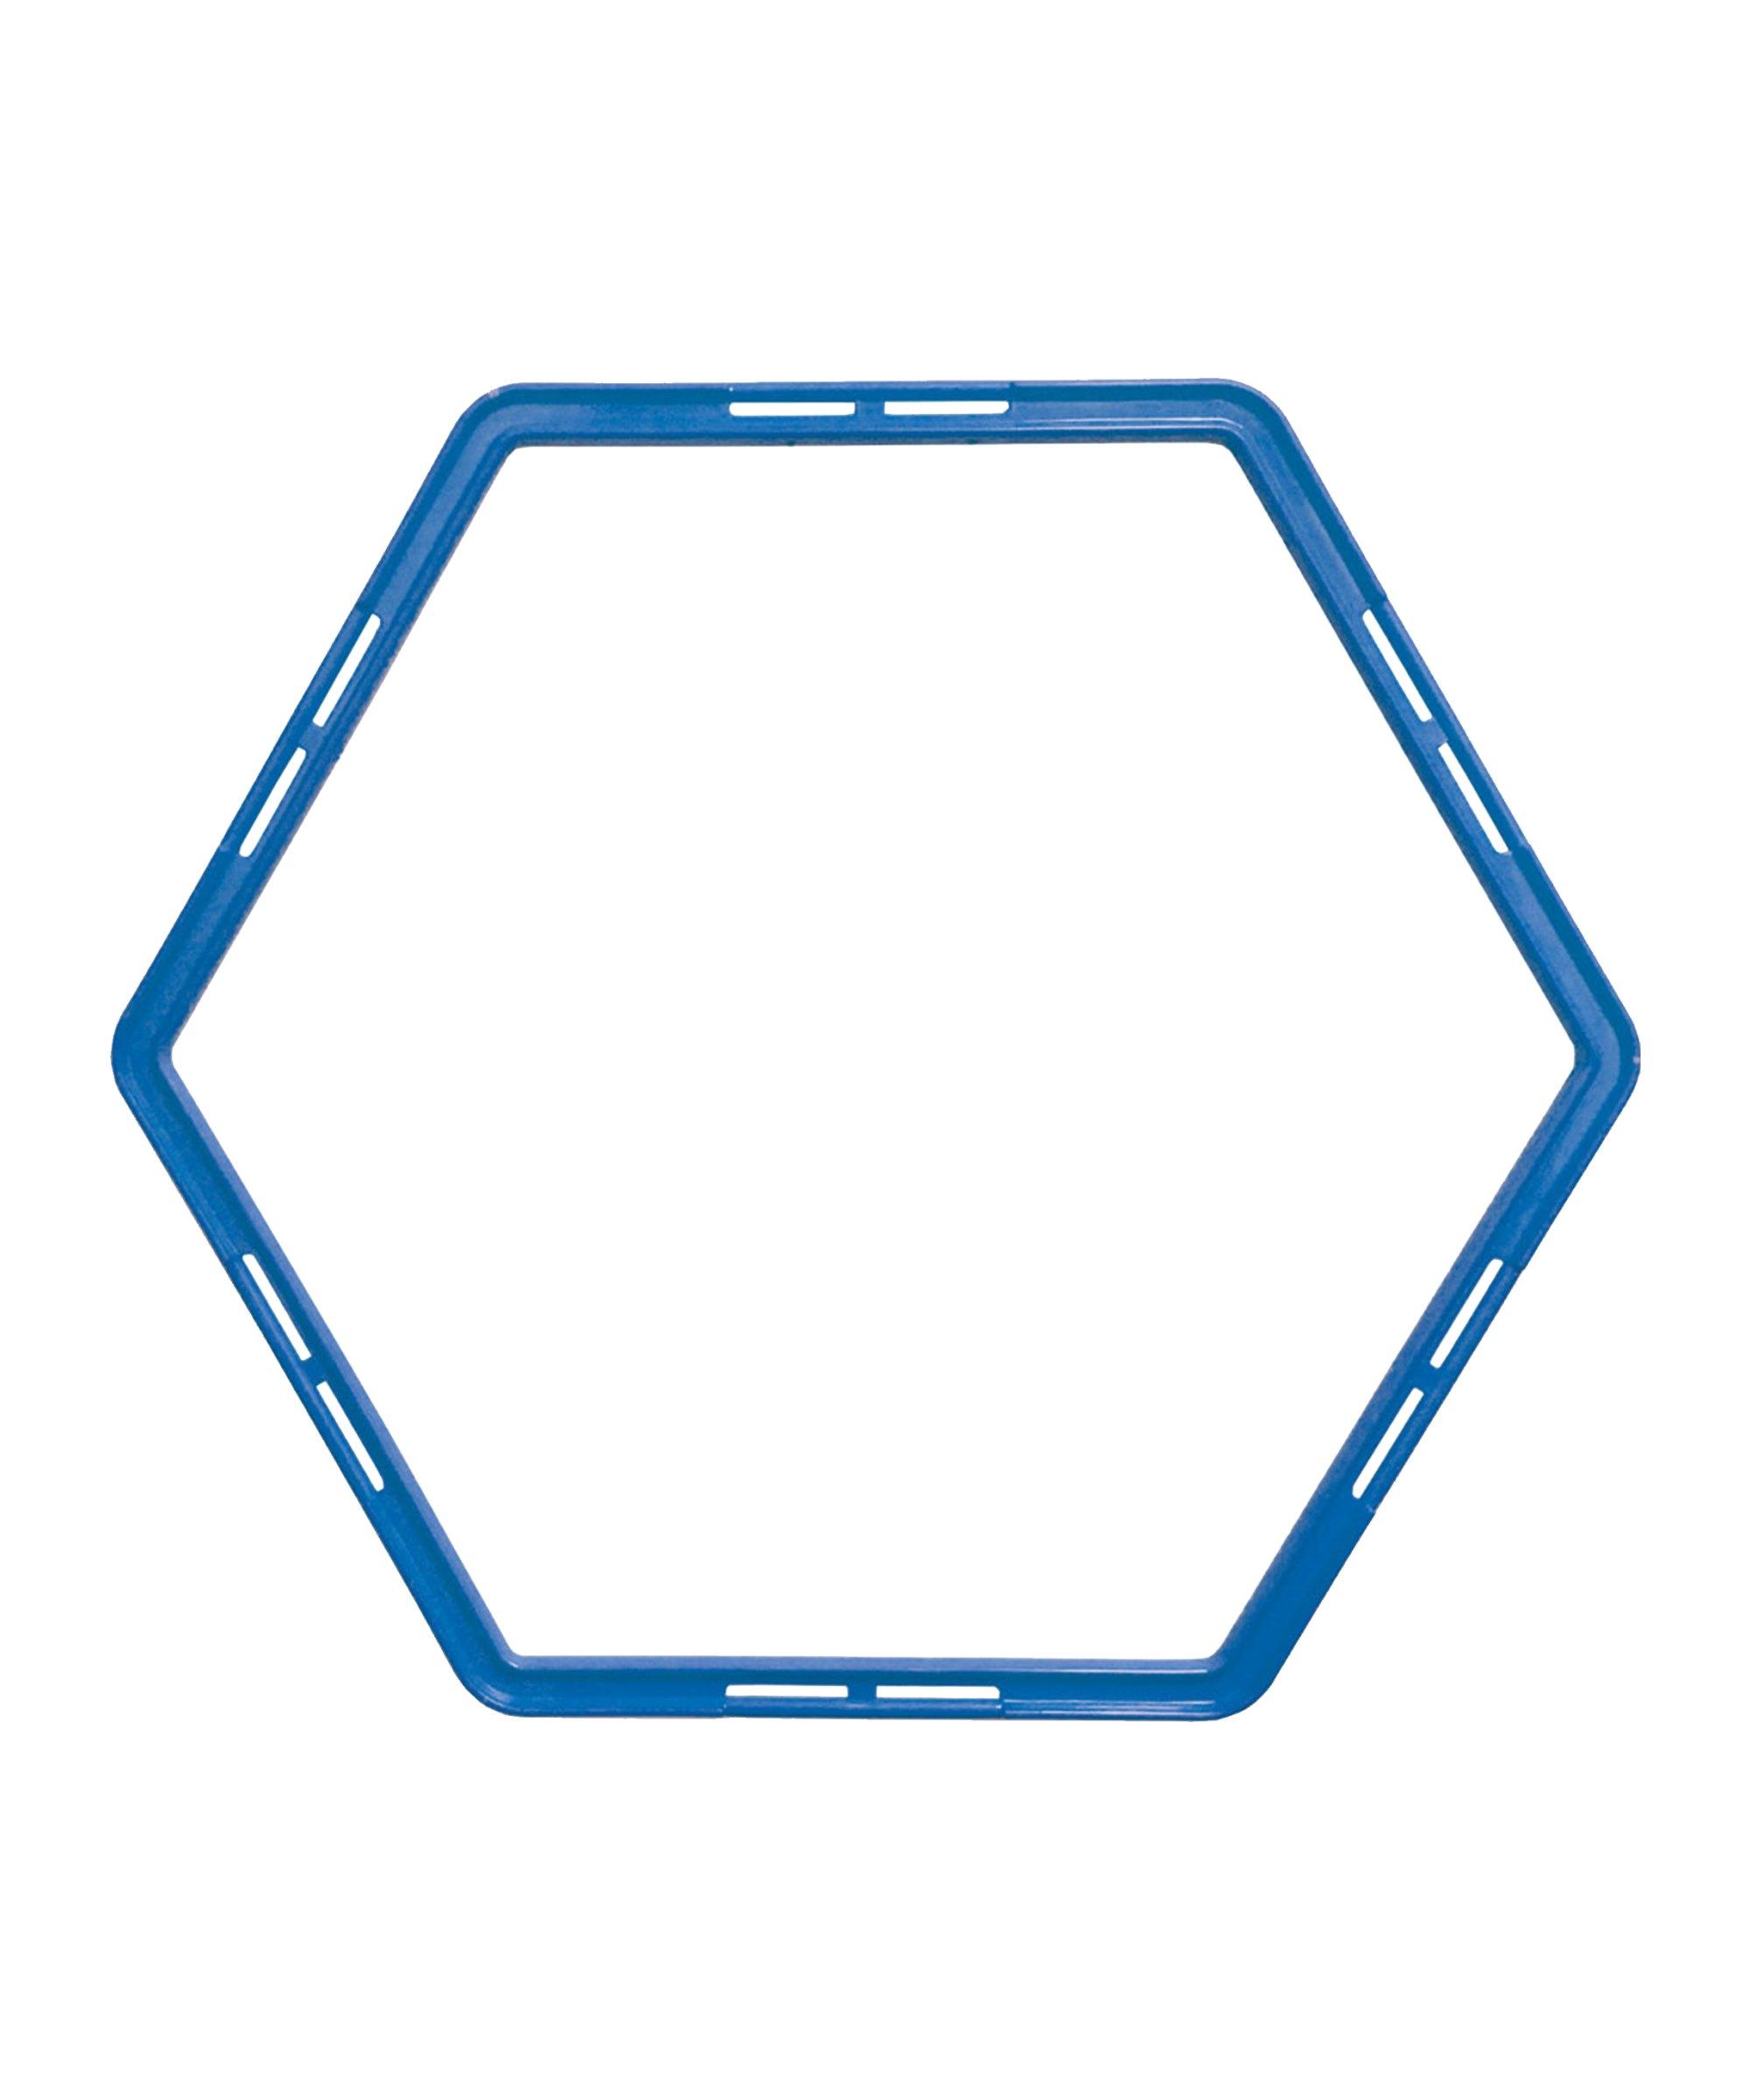 Cawila PRO TRAINING Hexa-Hoops Set d49mm Blau - blau